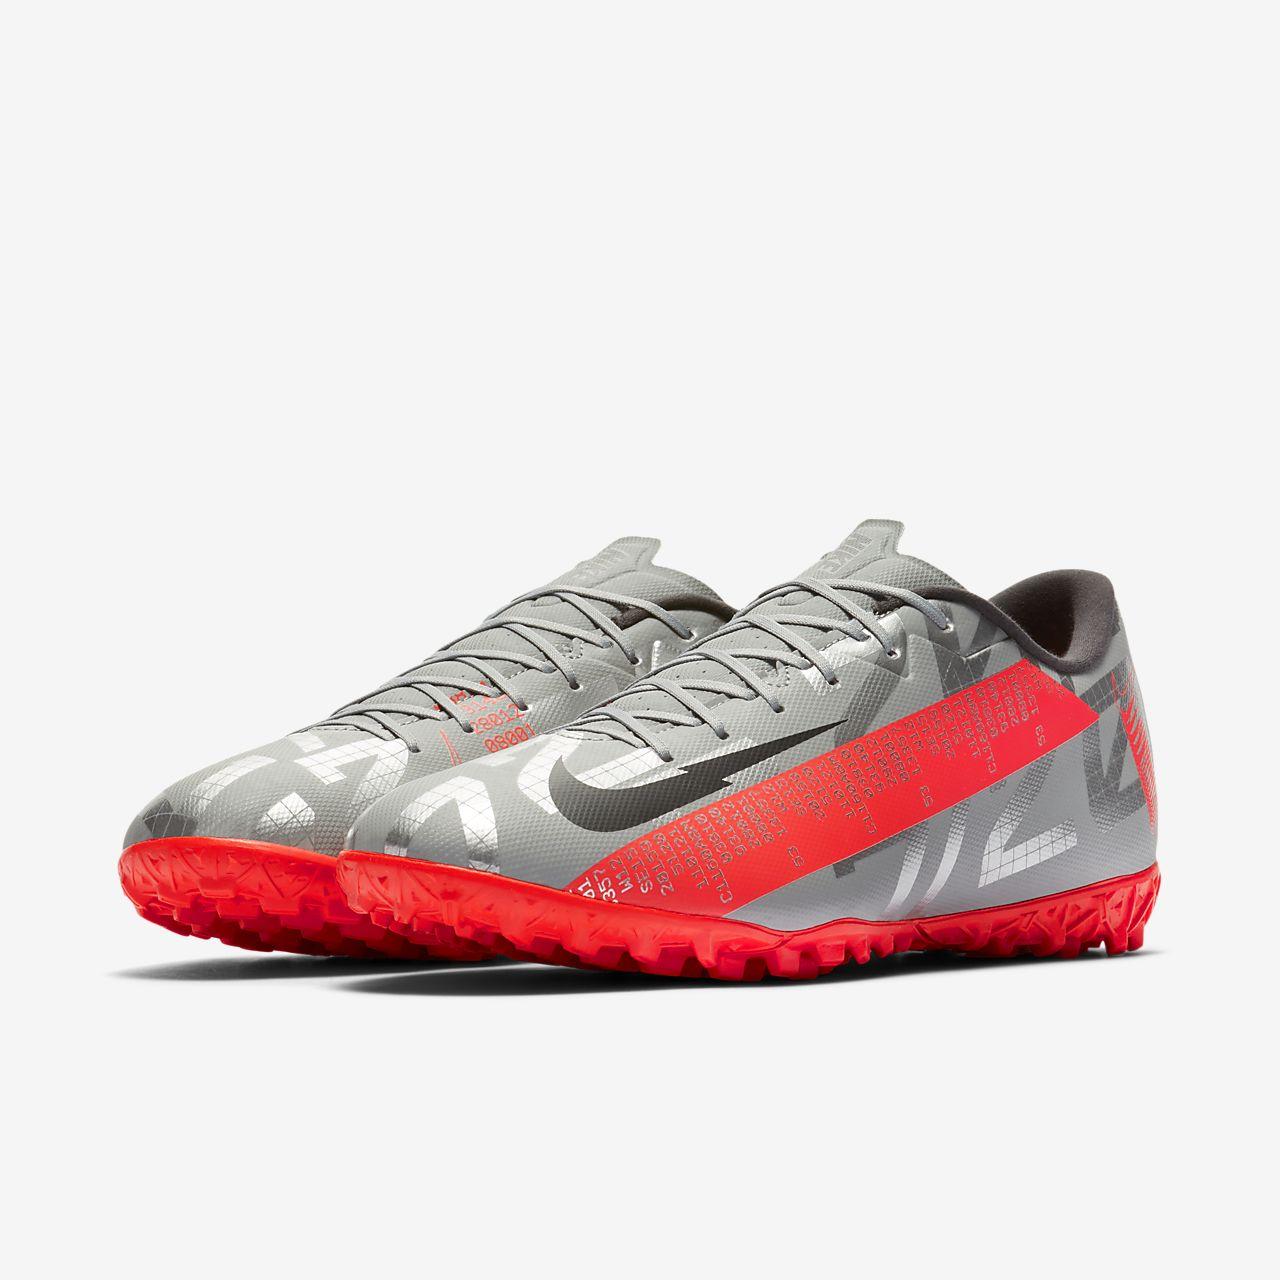 Nike Mercurial Vapor 13 Academy TF Turf